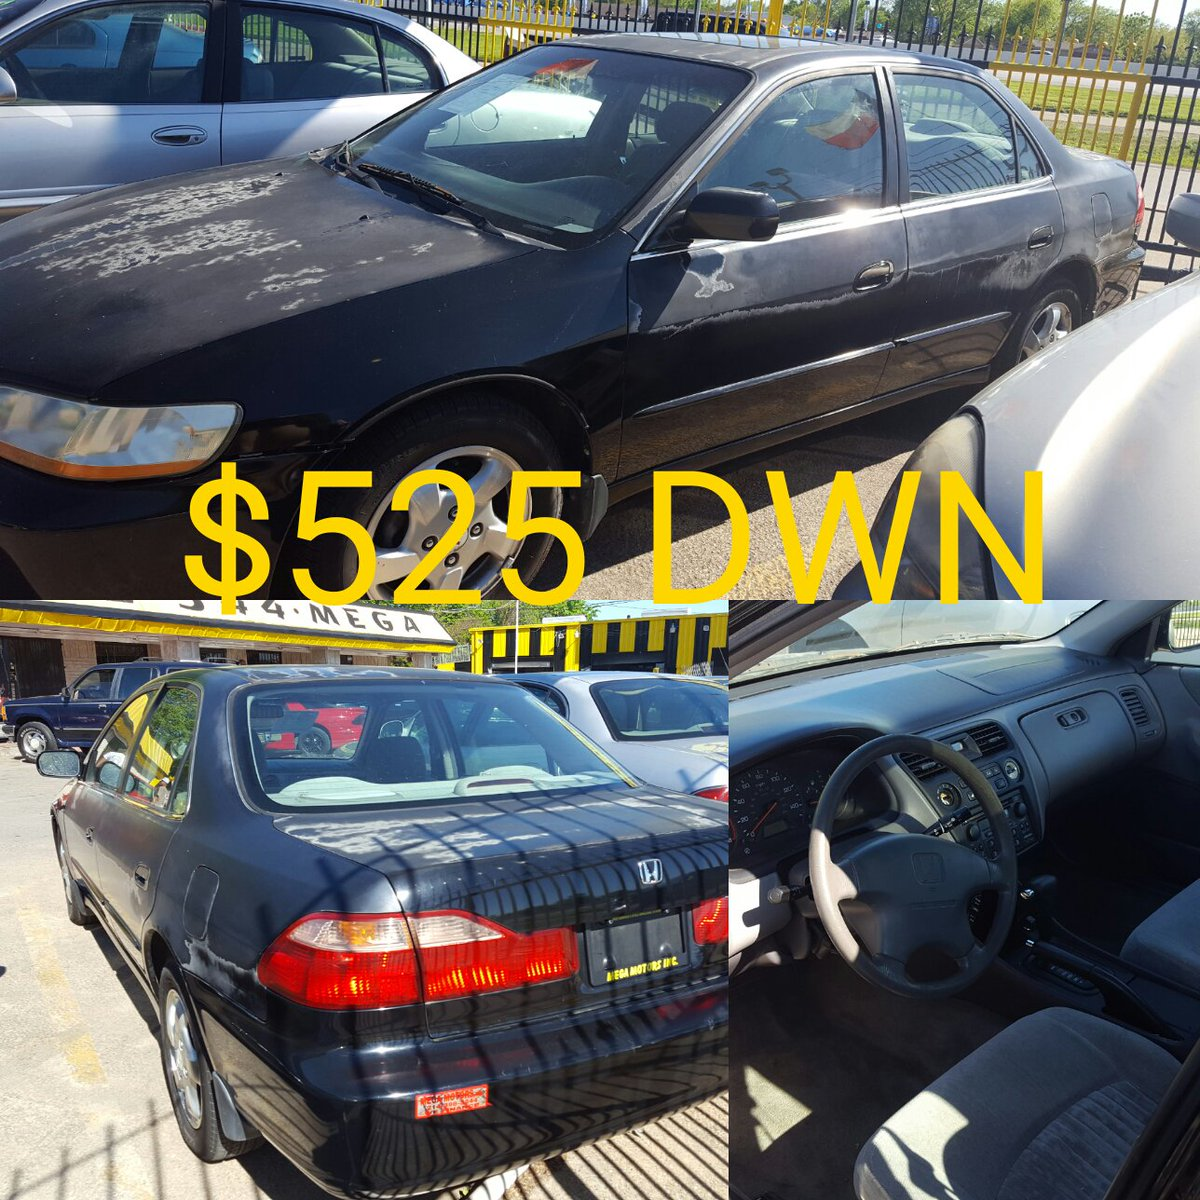 Chevrolet Dealers In Dallas: Mega Motors In Dallas